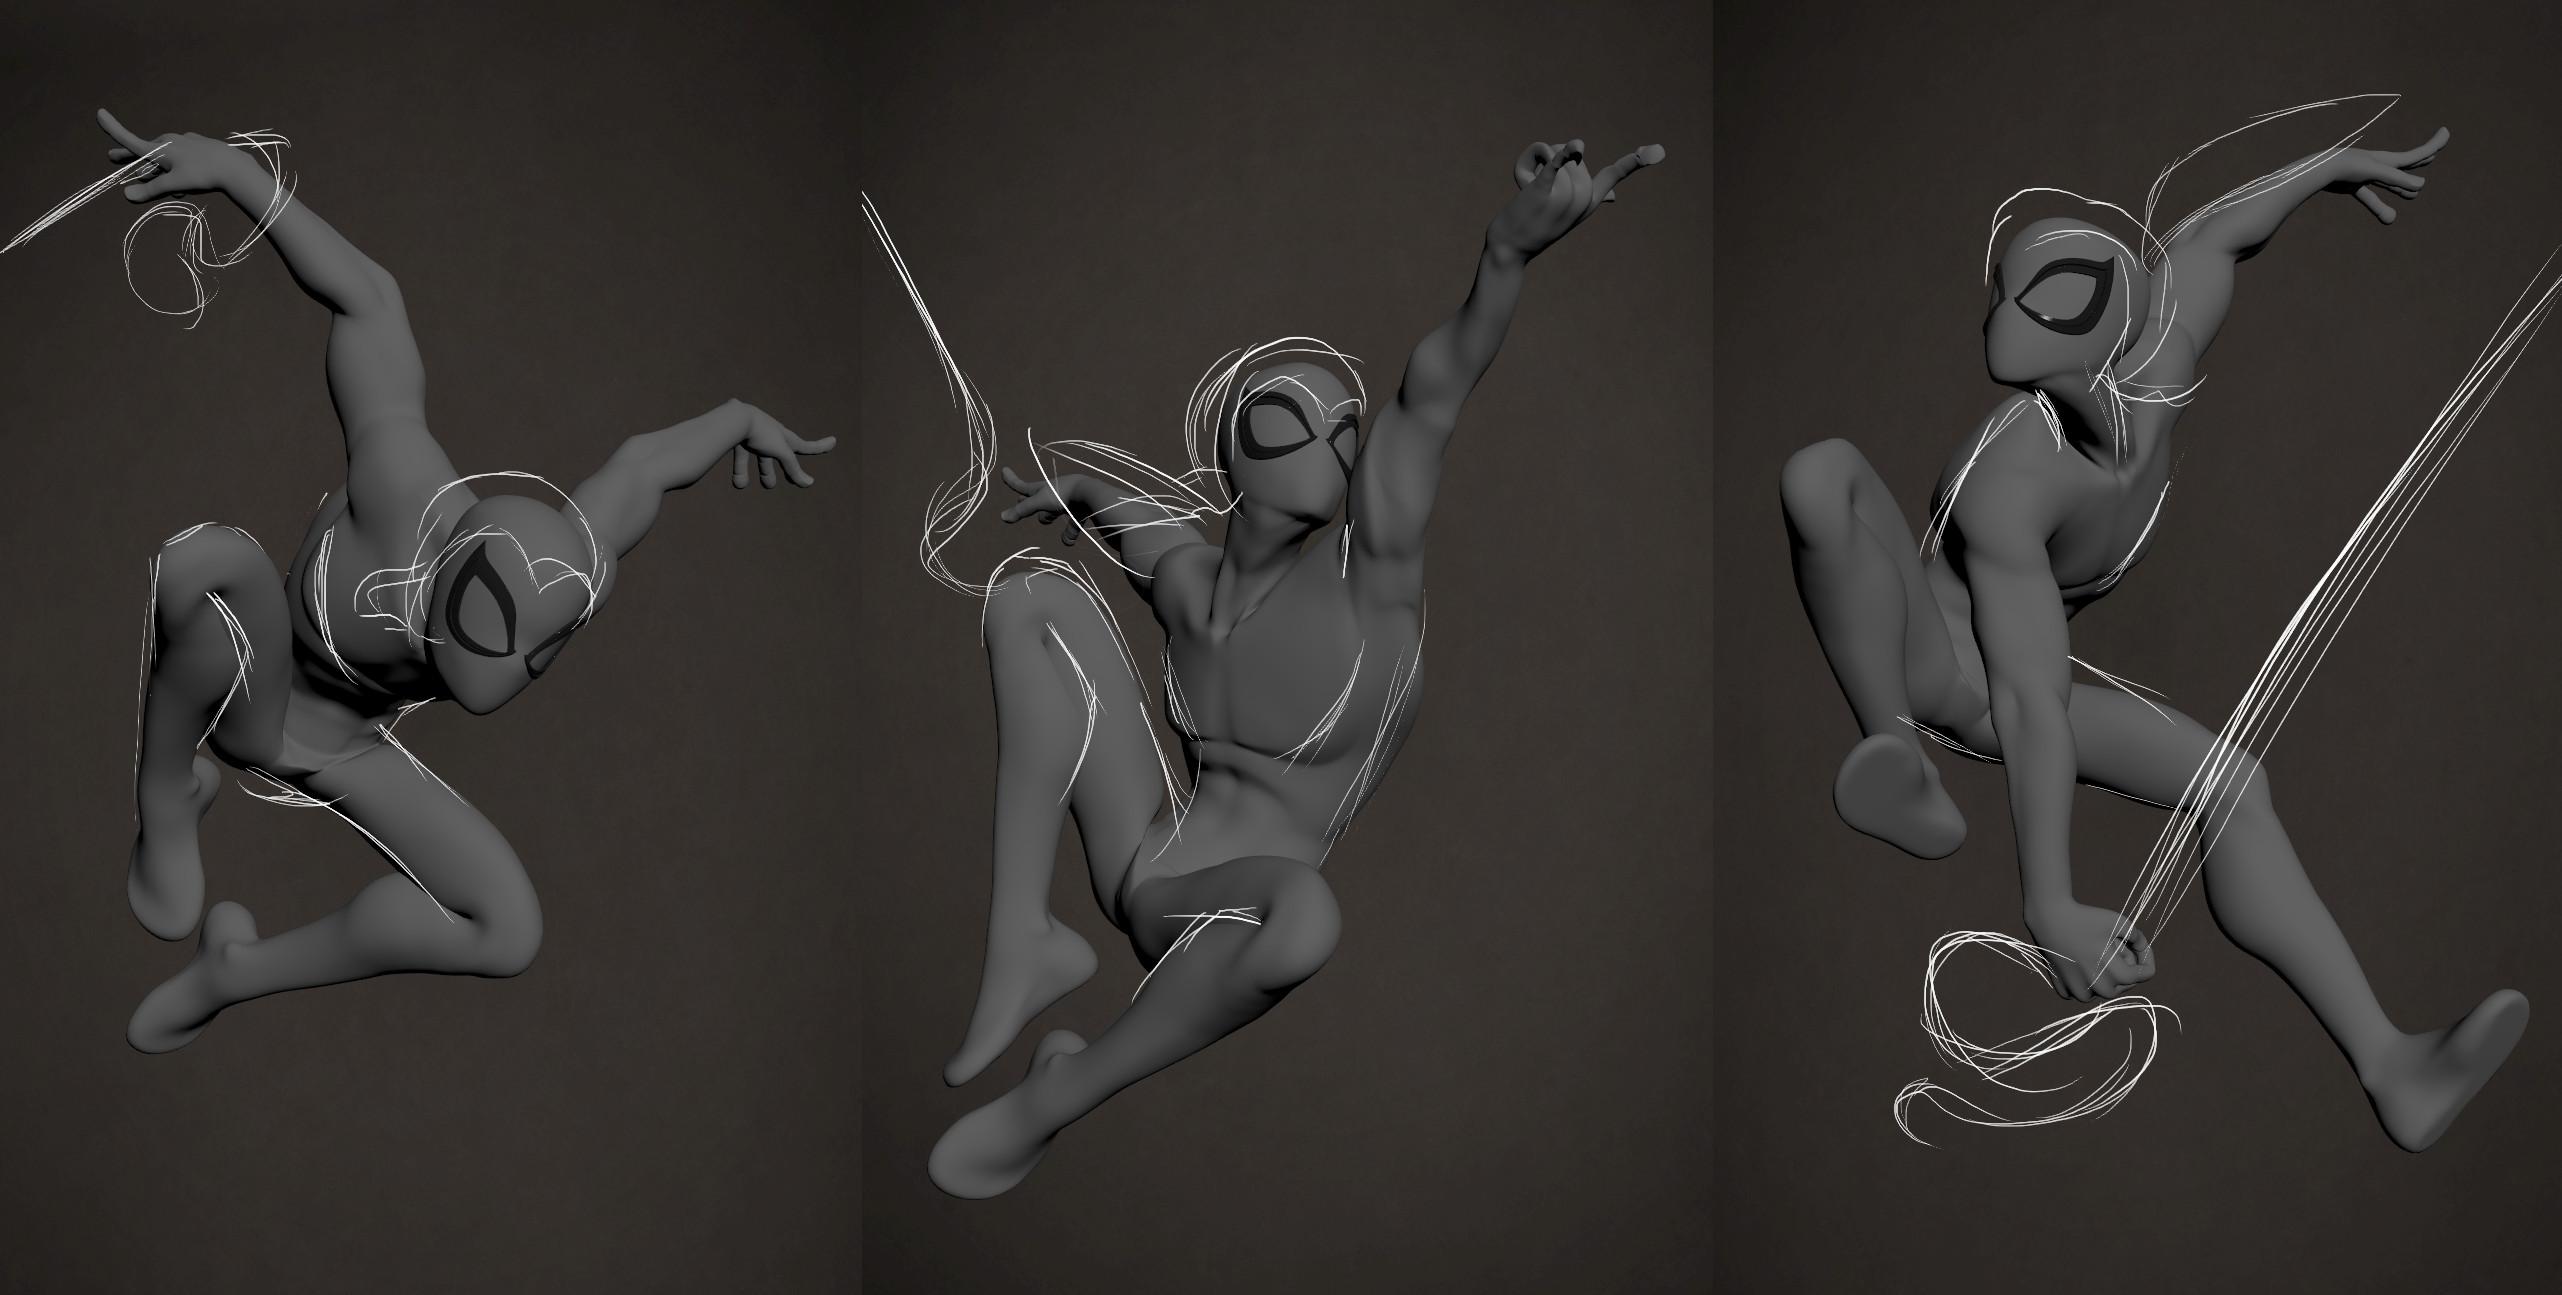 Spidey poses exploration